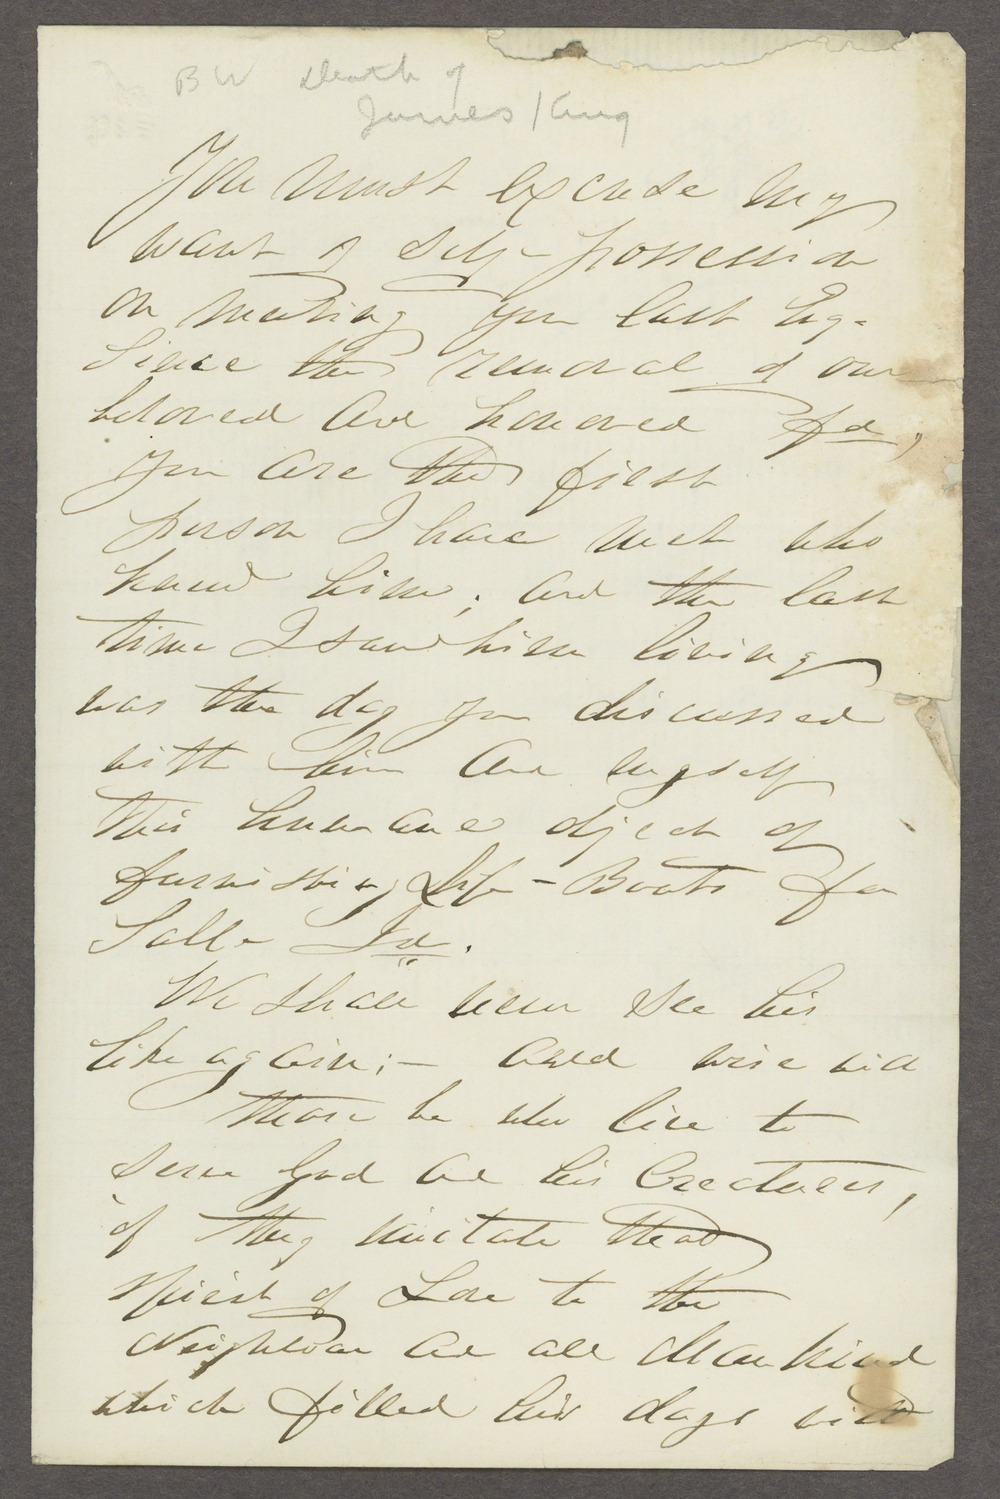 Dorothea Dix correspondence - 1 [Box 1 Folder 2]